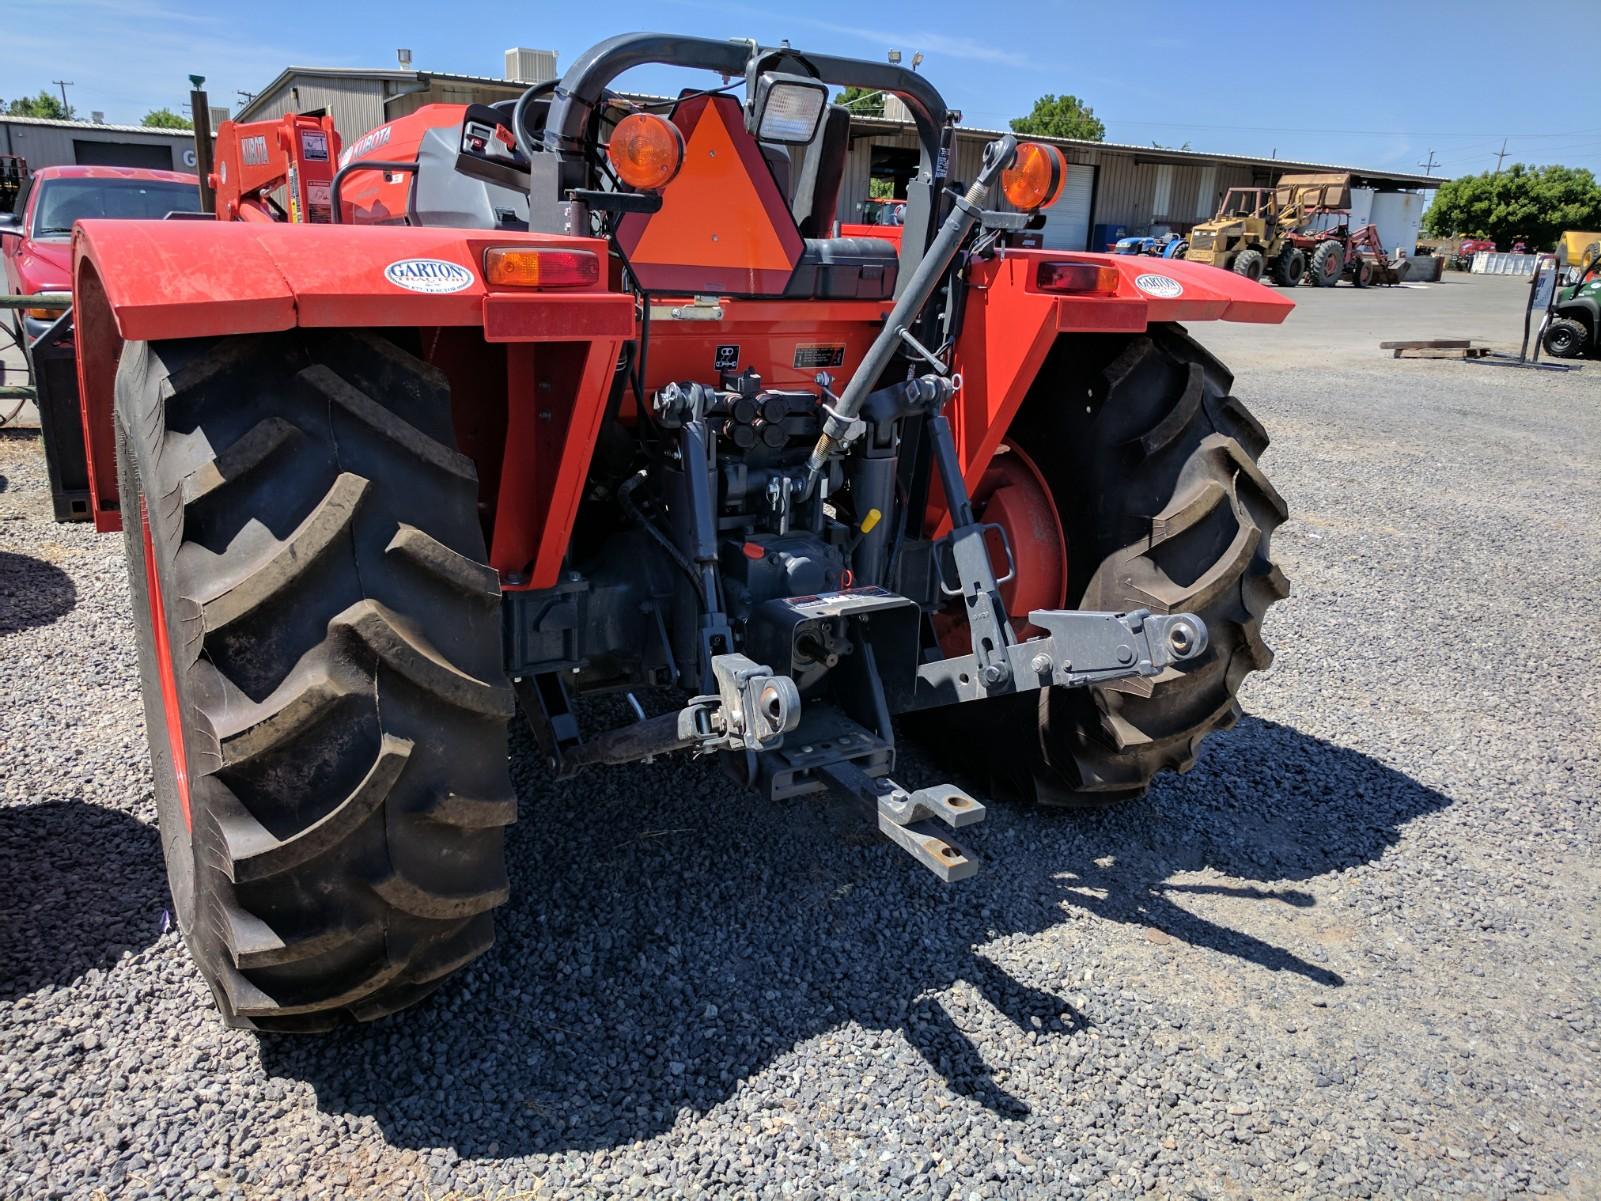 Low Profile Tractor : Kubota m l low profile tractor tire options garton